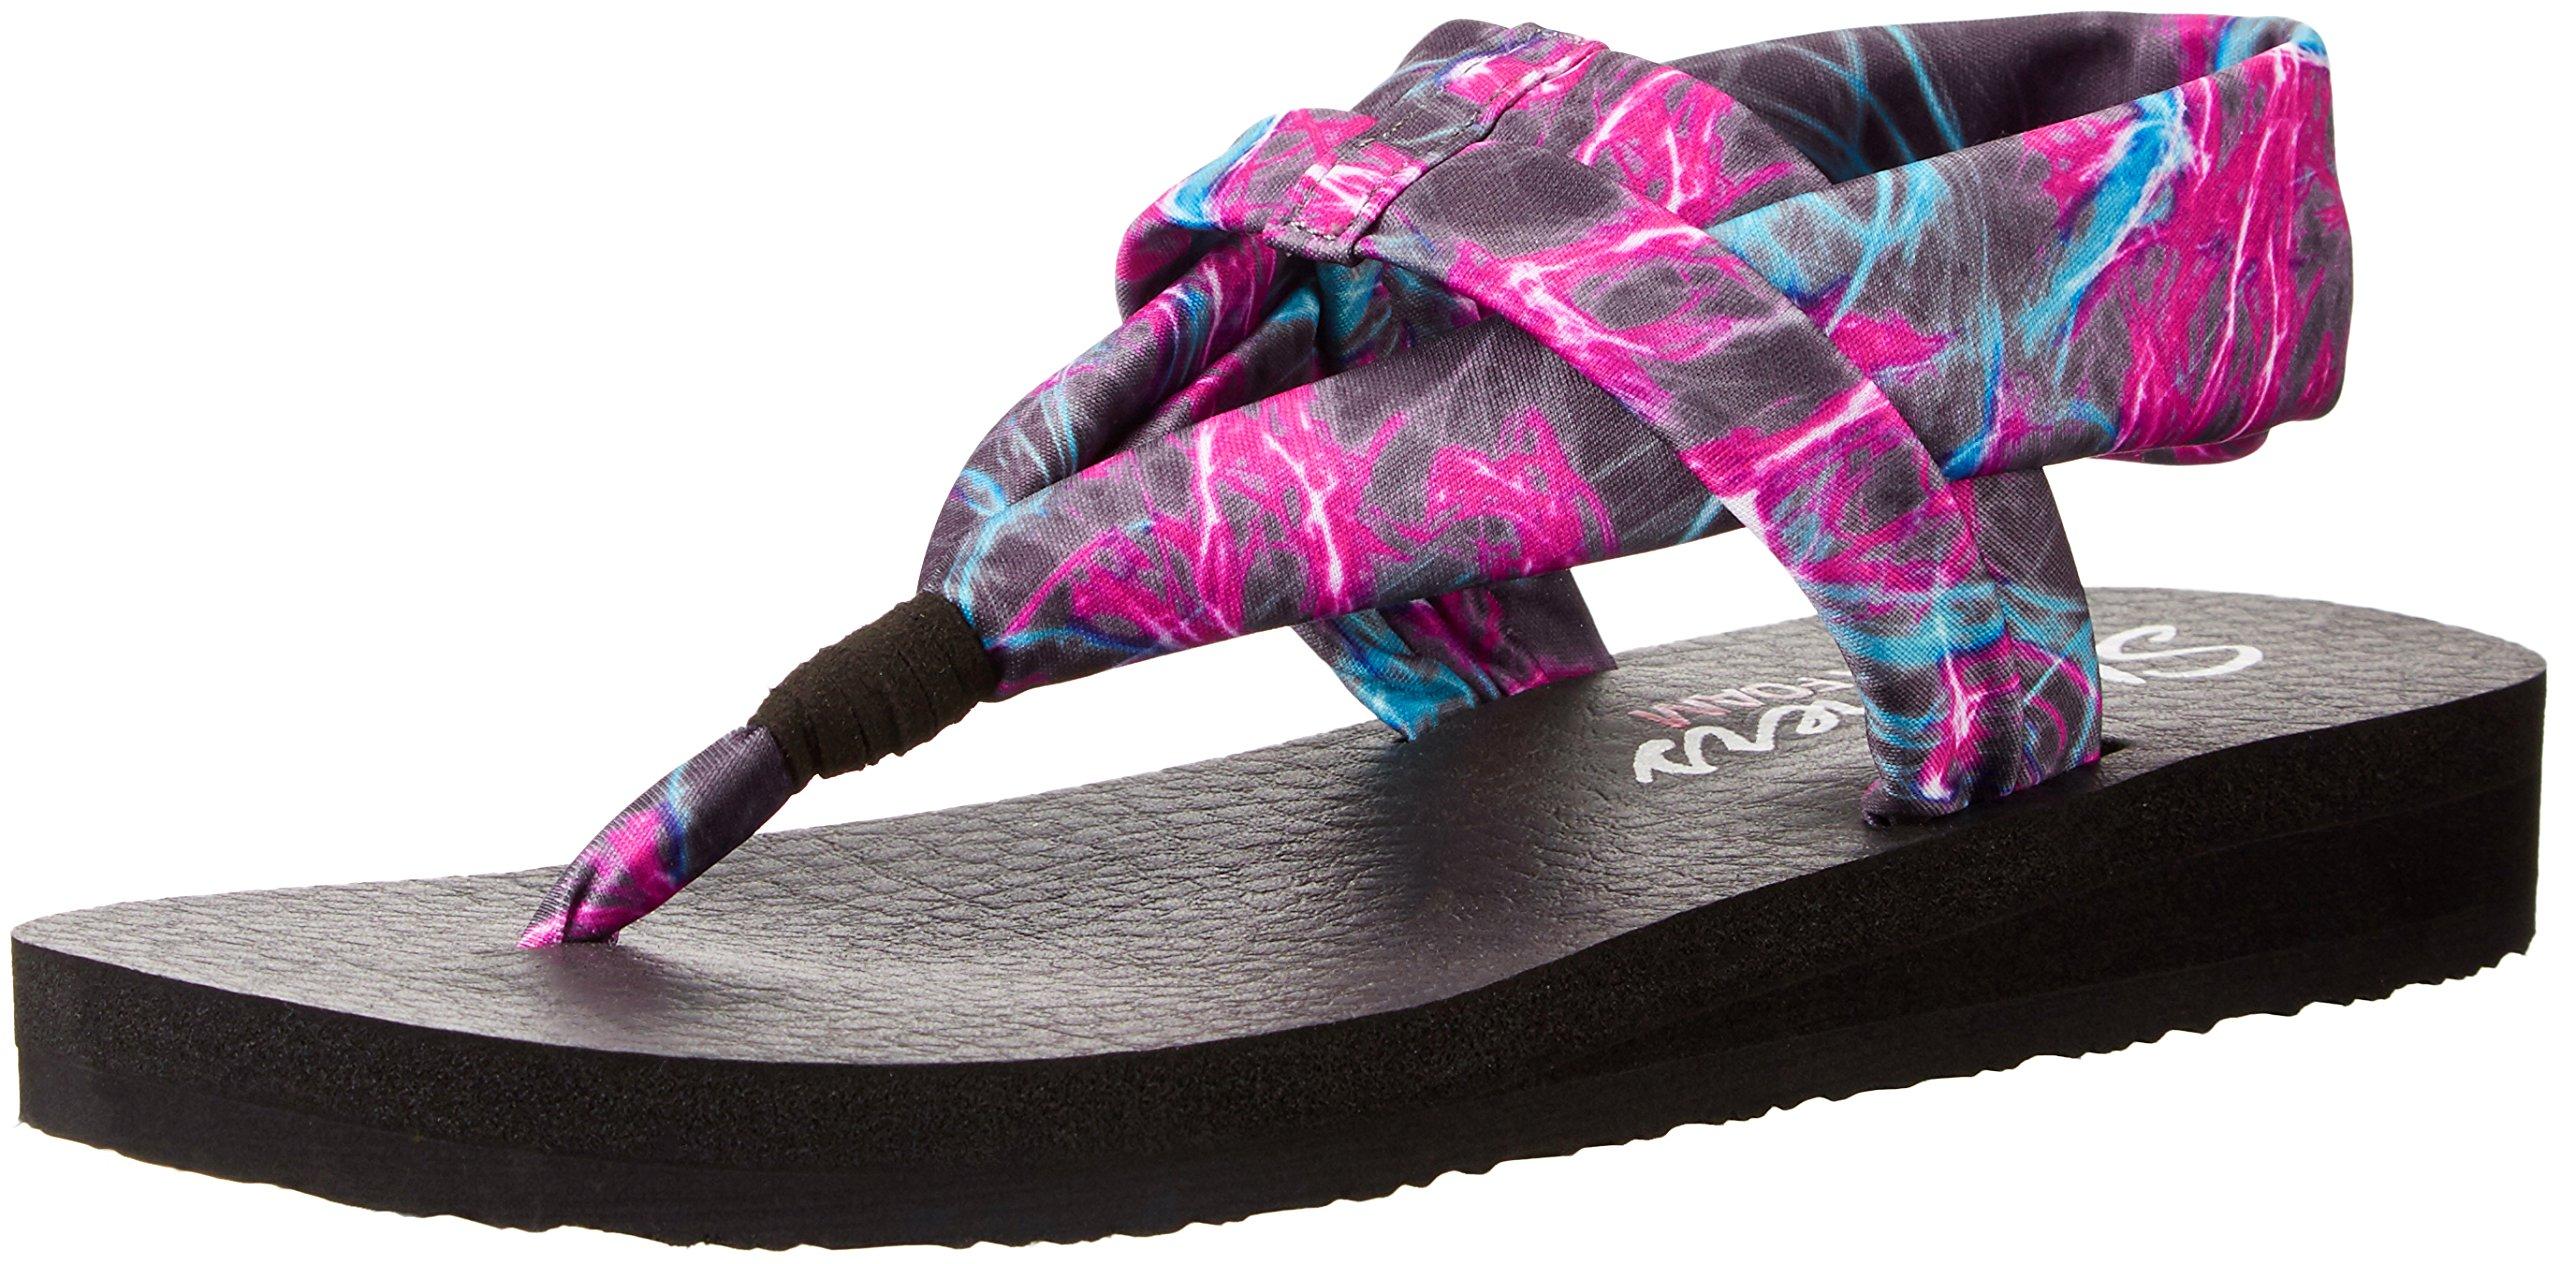 Skechers Cali Women's Meditation Slingback Yoga Flip-Flop,Black/Multi,9 M US